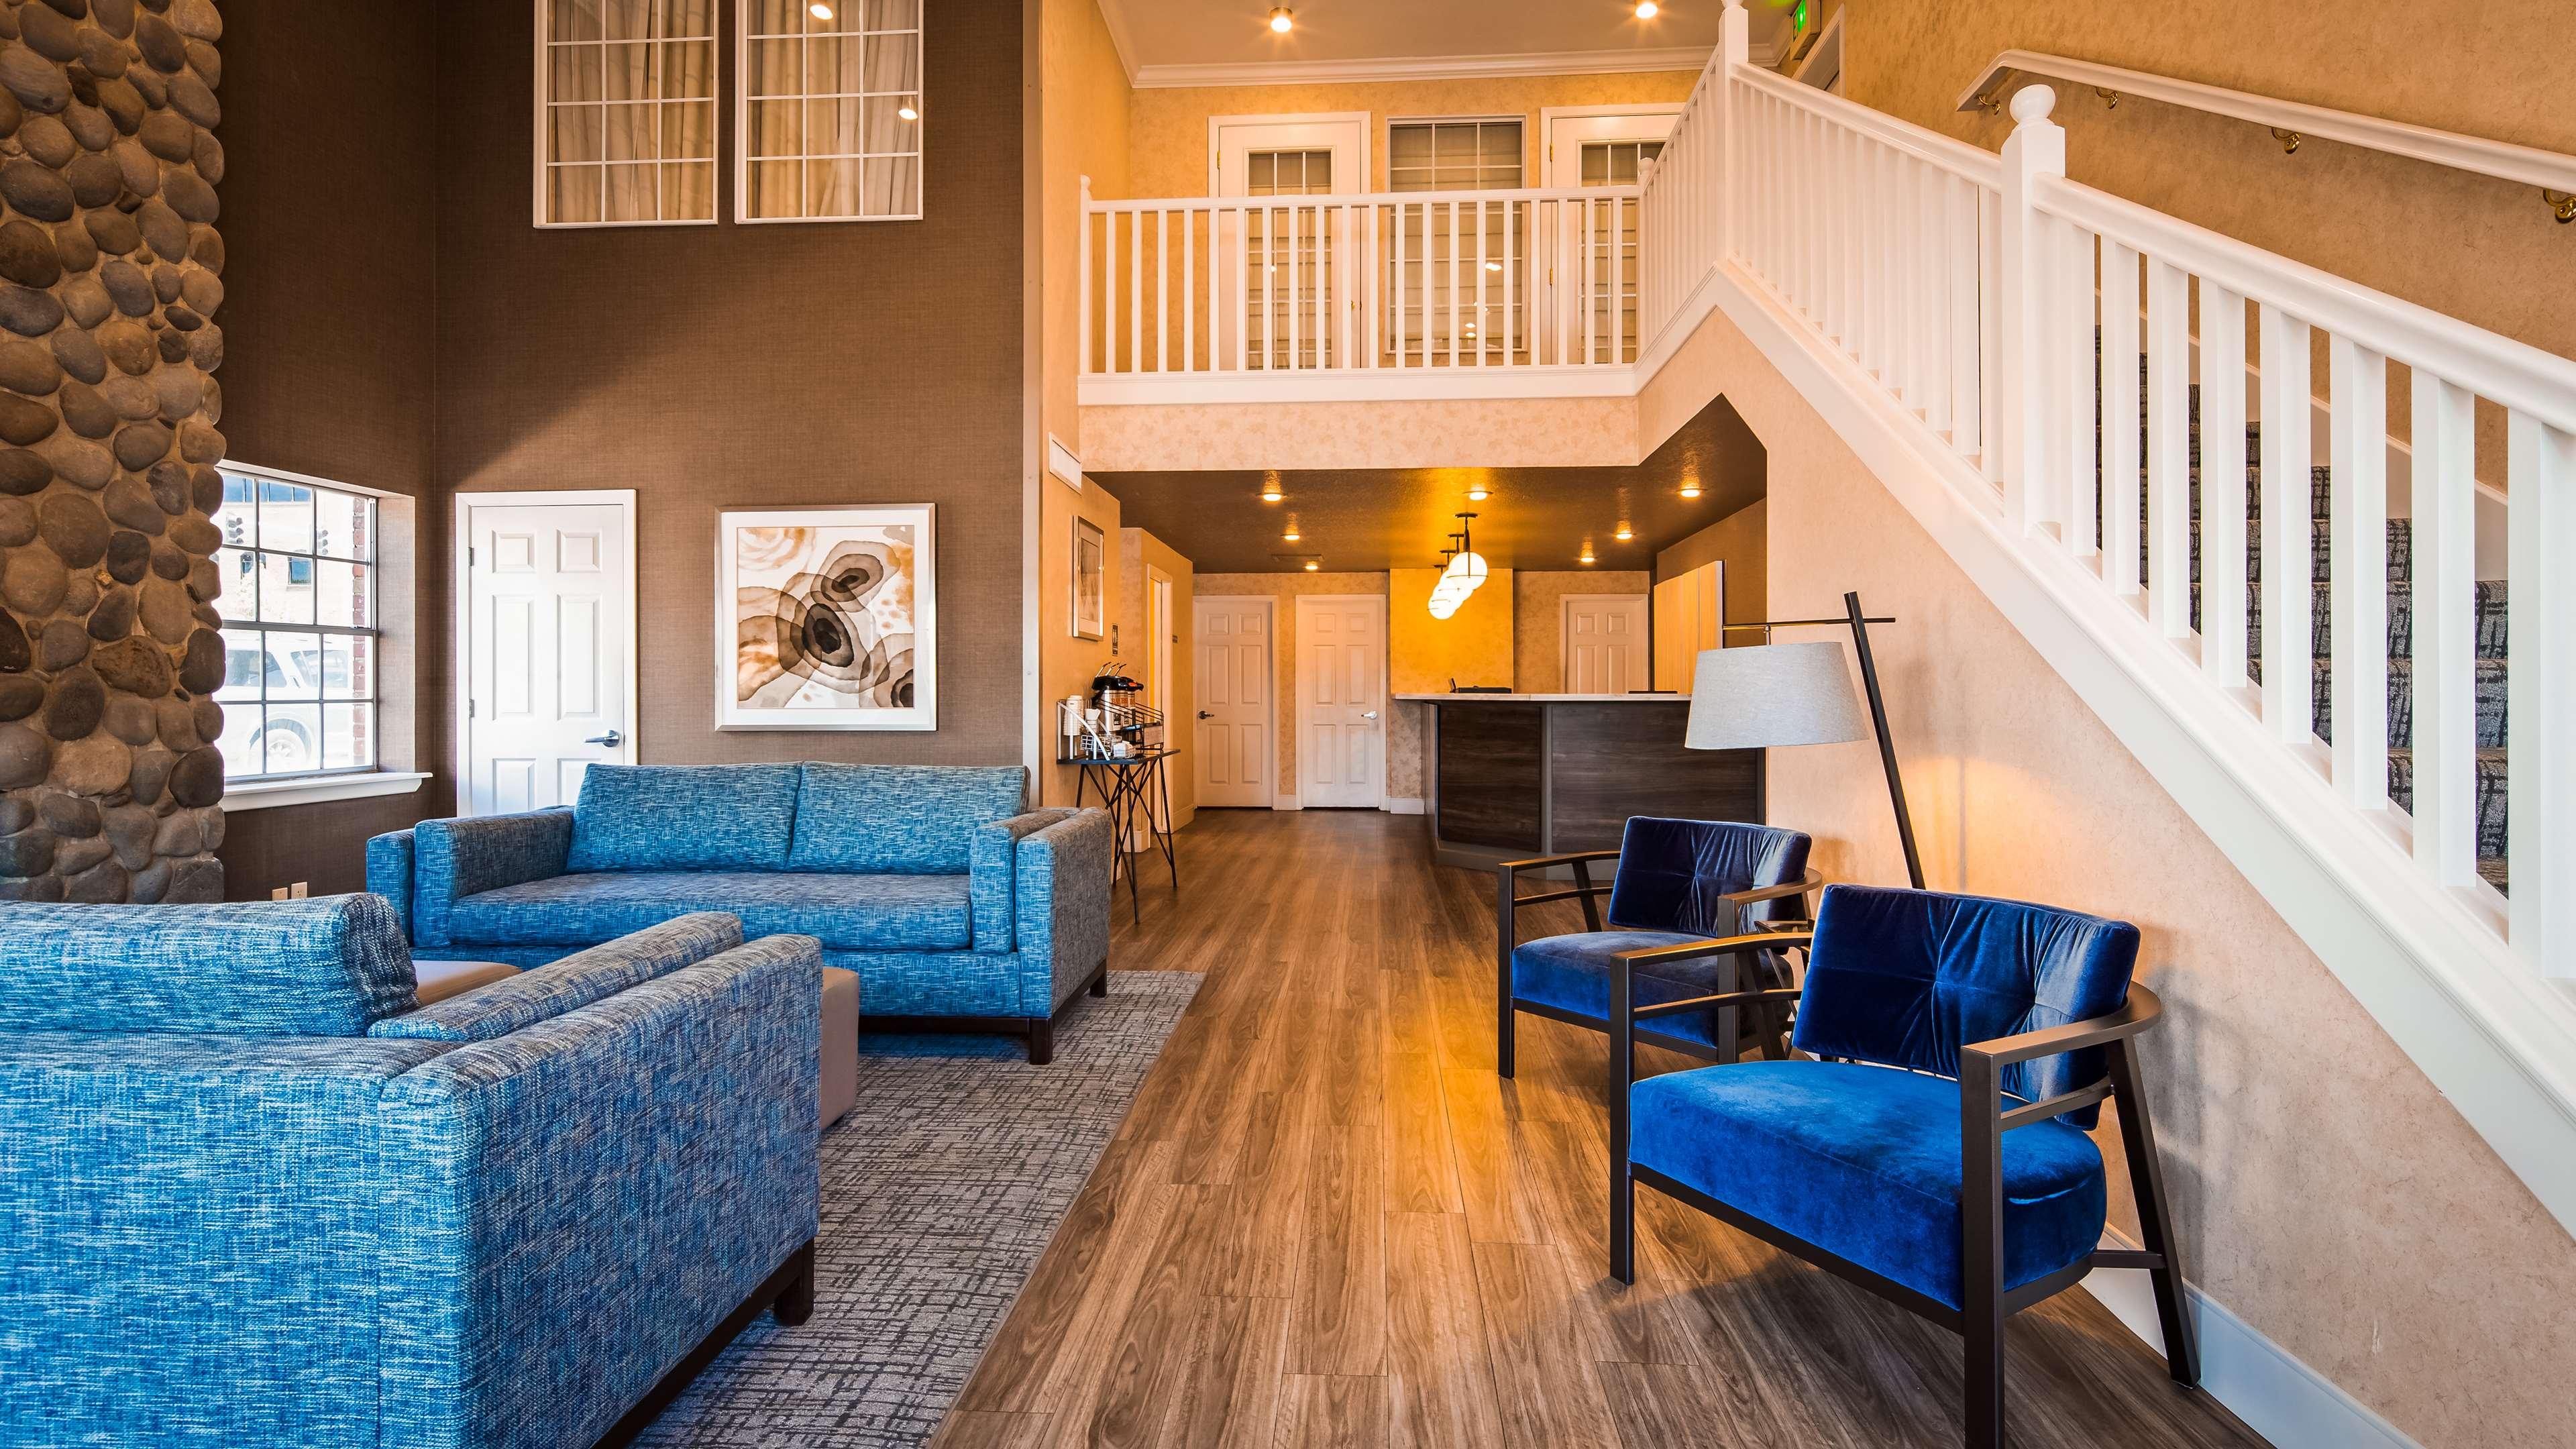 Best Western Horizon Inn image 6